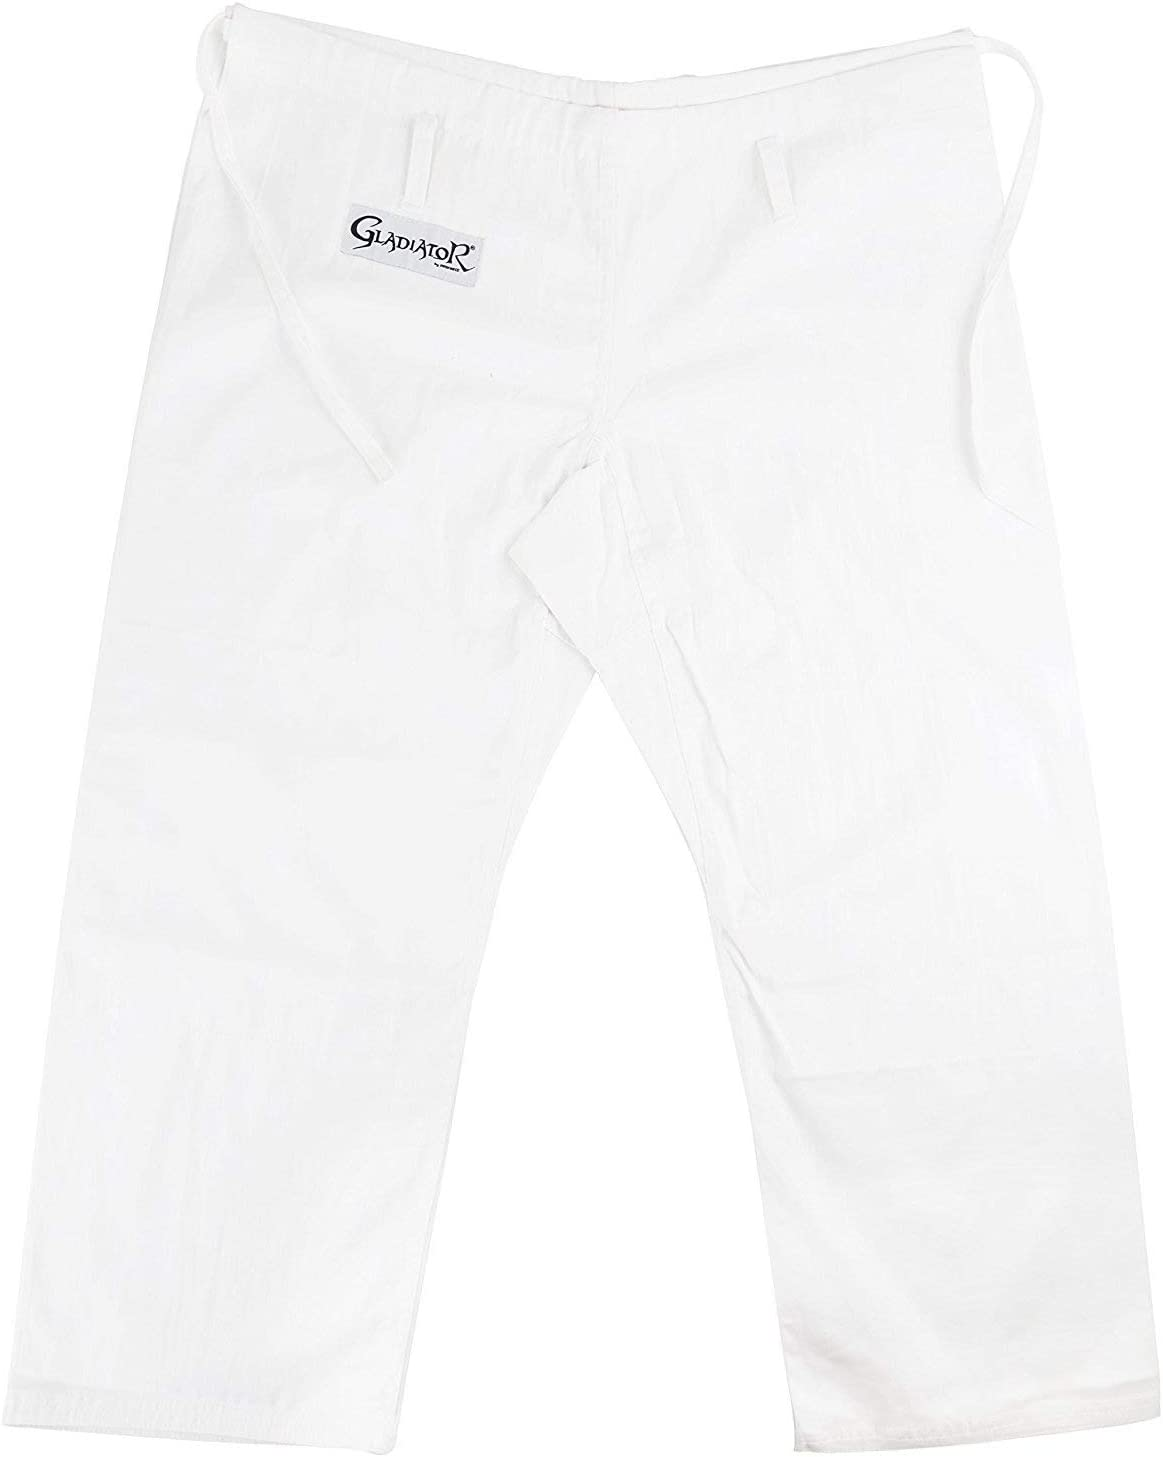 Size 000 PROFORCE Gladiator Judo Pants White